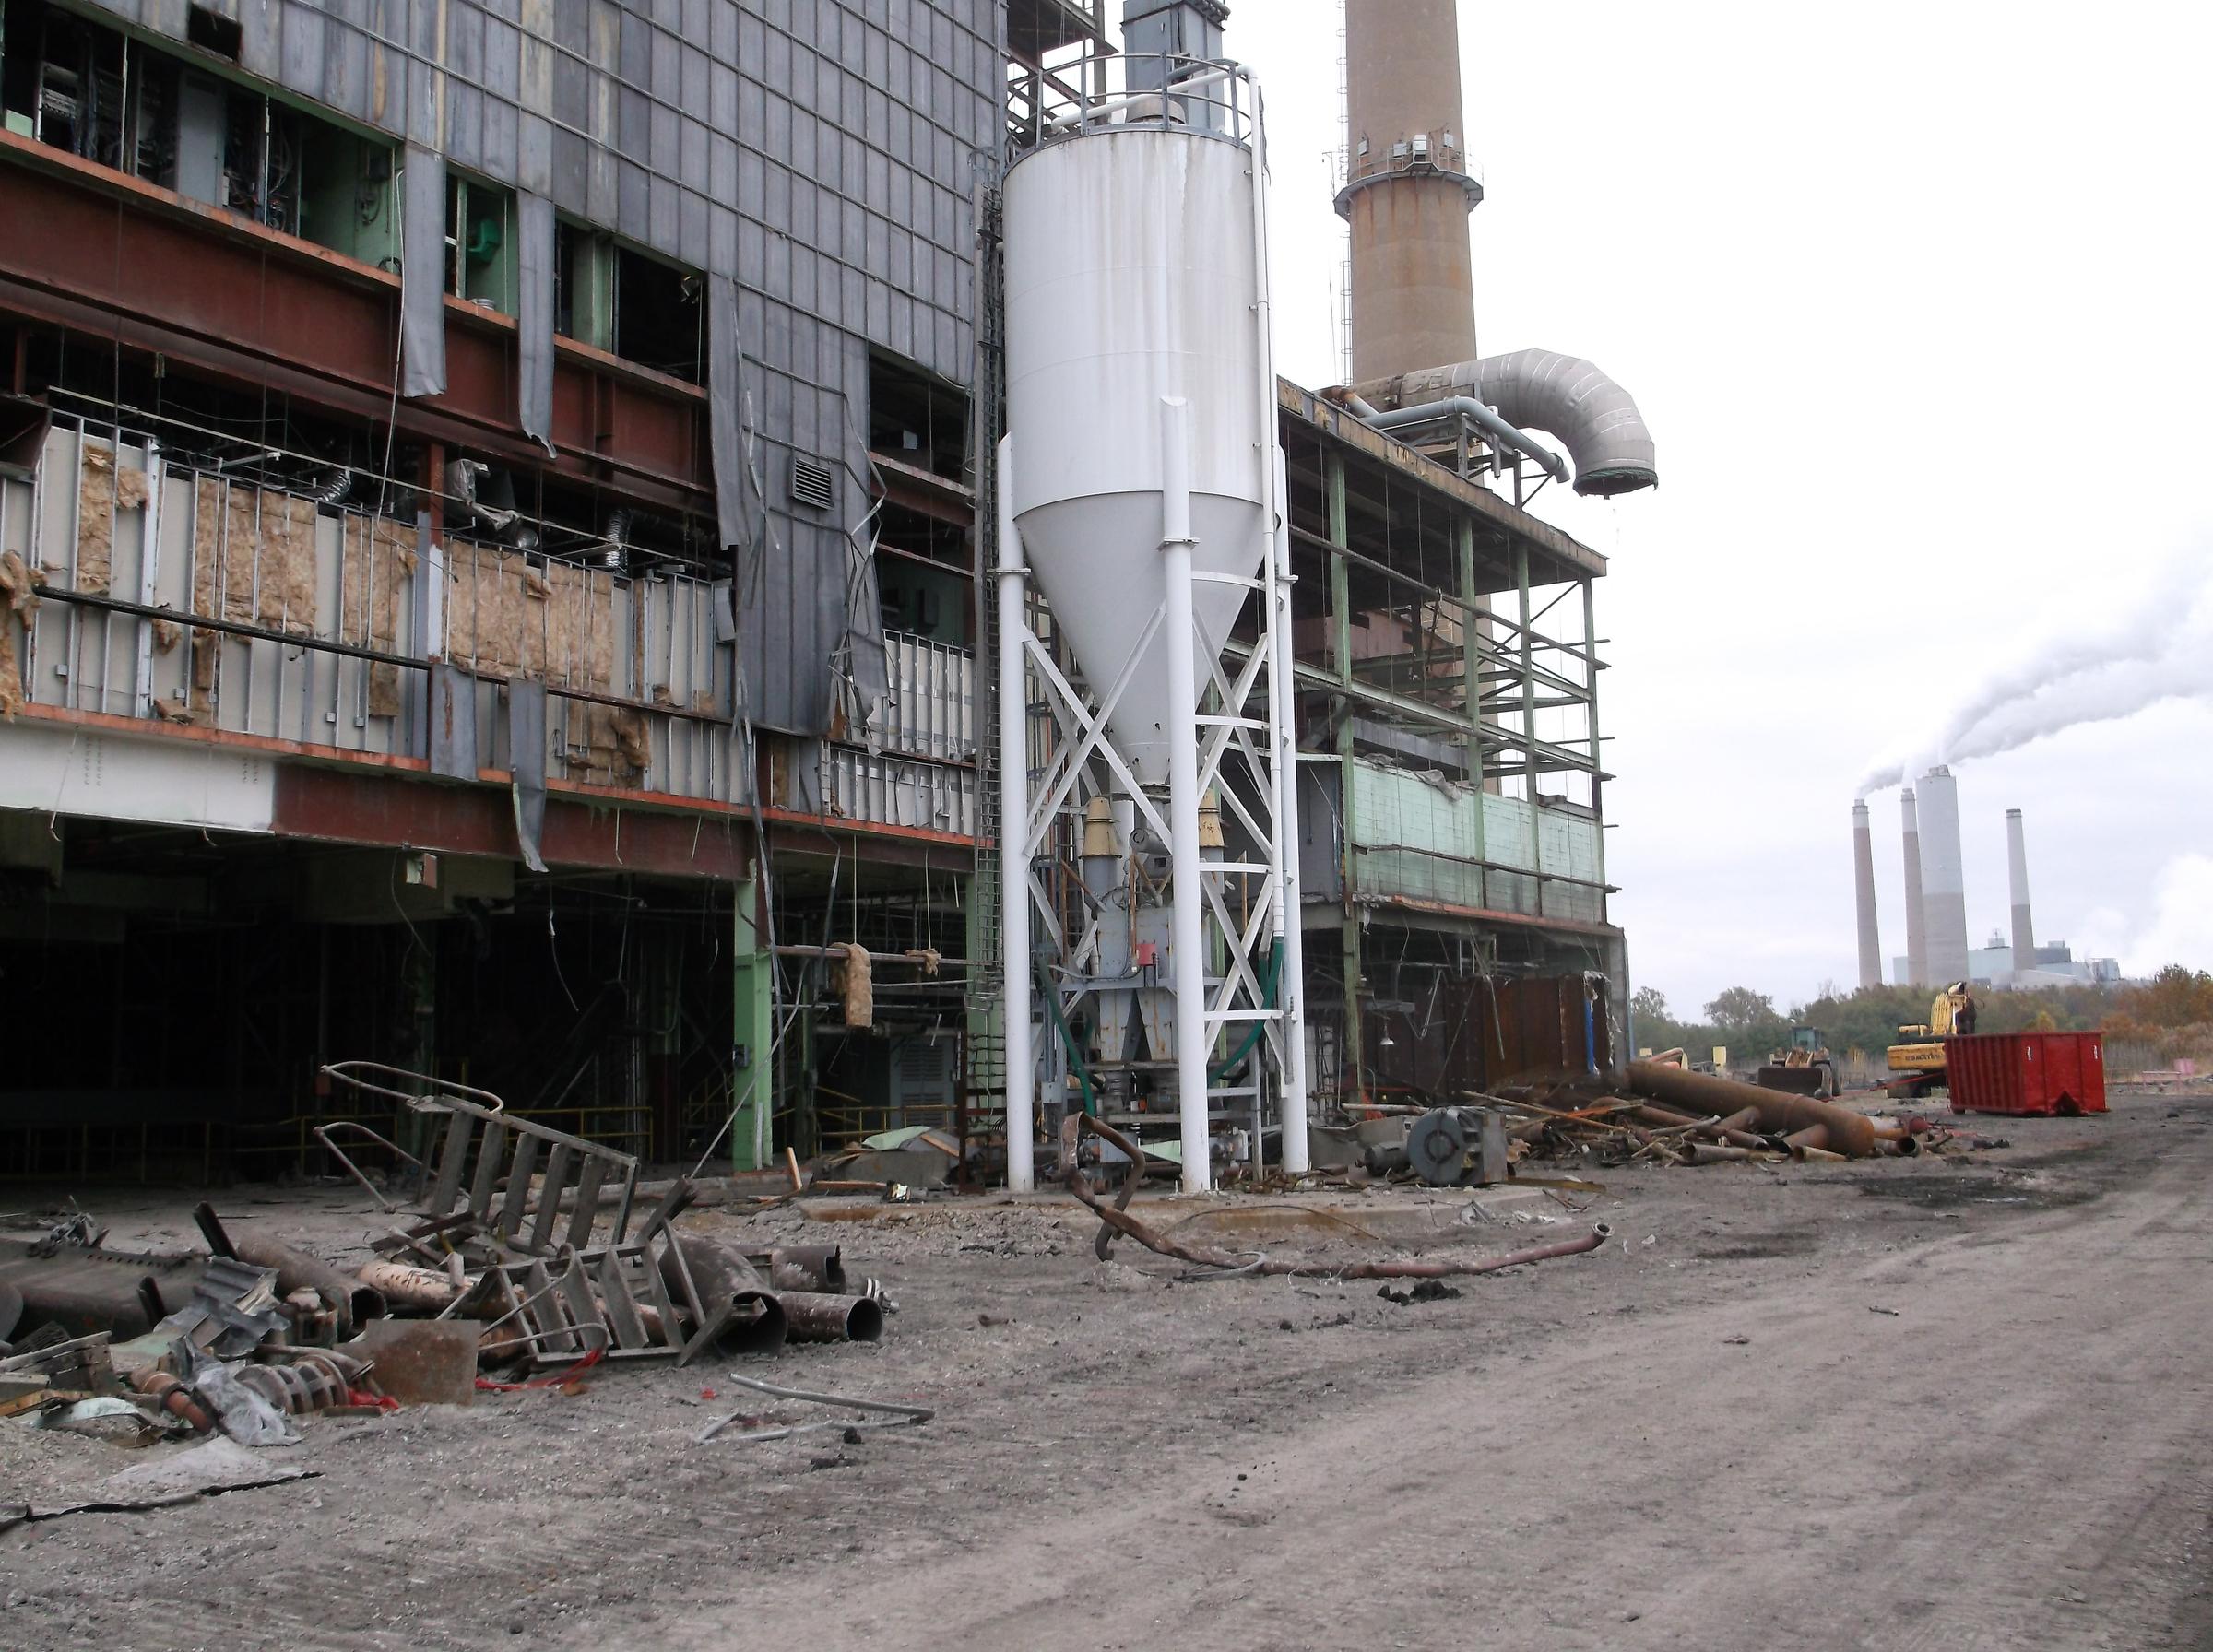 08_KERAMIDA_Hoosier_Energy_Ratts.JPG